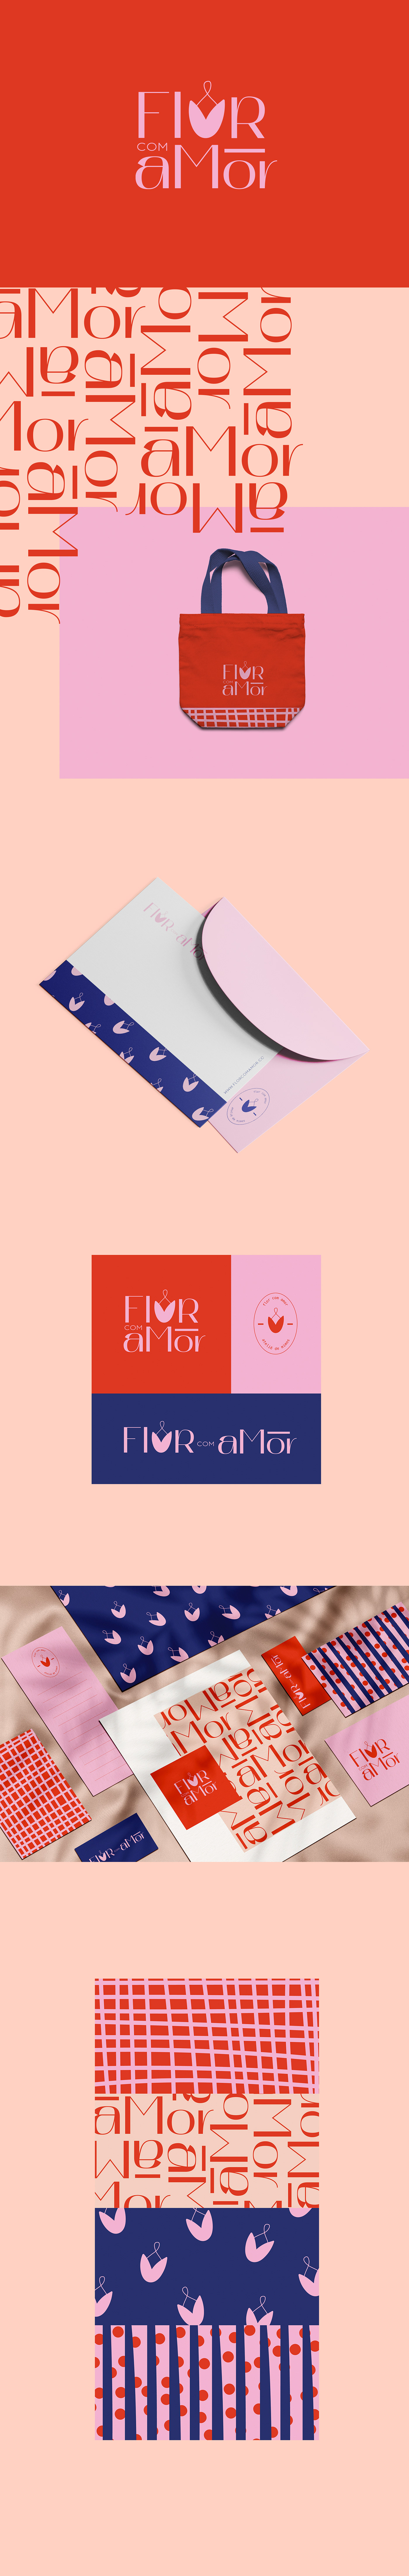 brand,cute,identity,logo,Love,pattern,prints,Stationery